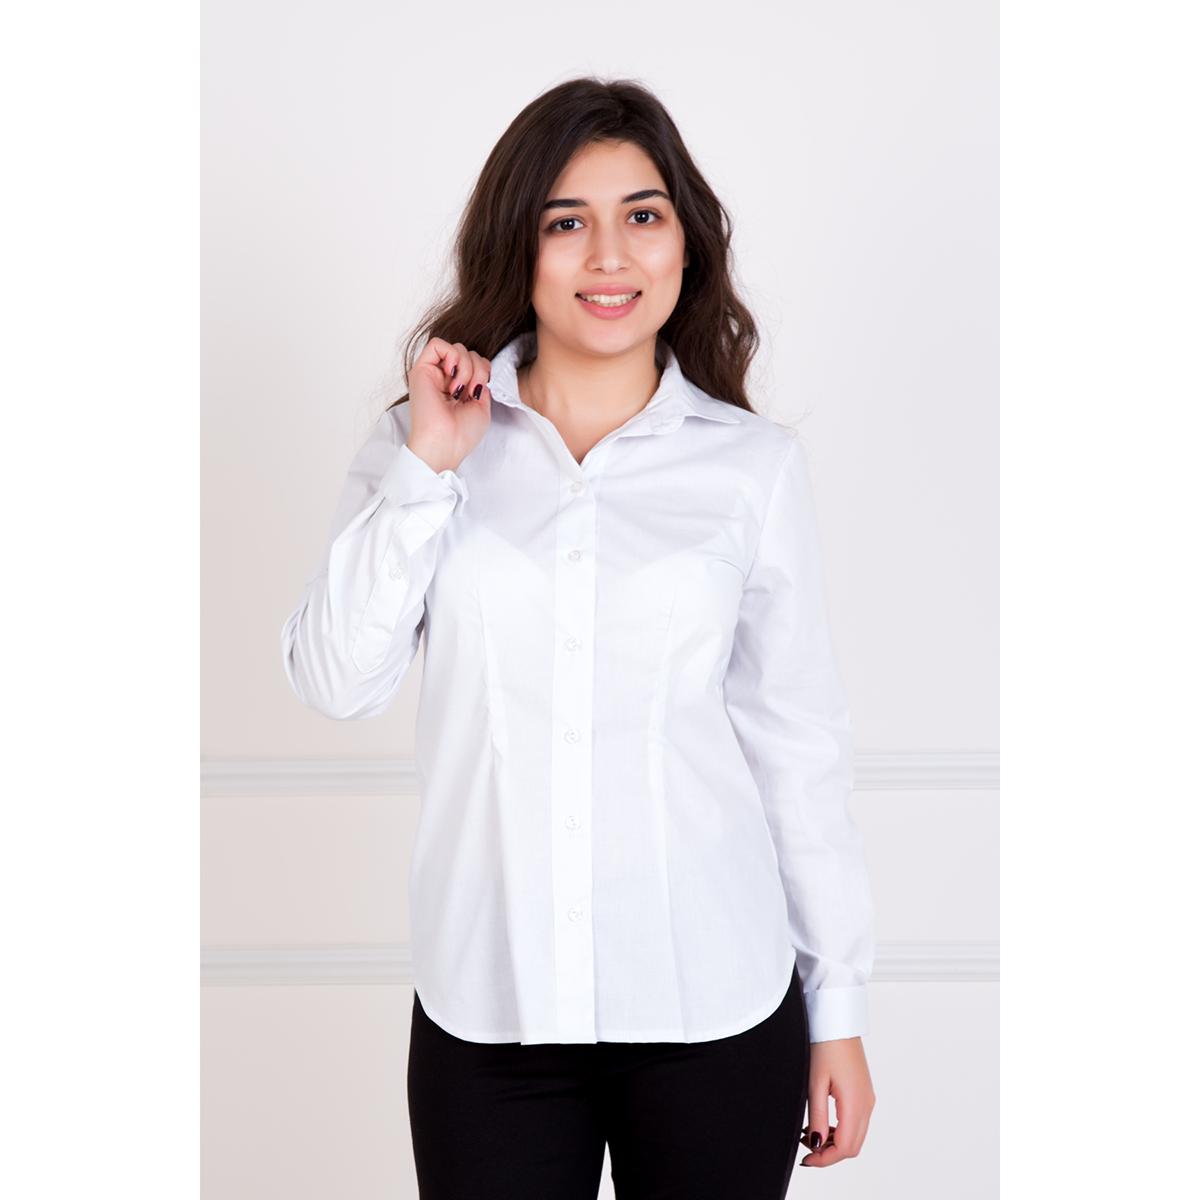 Женская рубашка Герда, размер 54Рубашки<br>Обхват груди:108 см<br>Обхват талии:88 см<br>Обхват бедер:116 см<br>Рост:167 см<br><br>Тип: Жен. рубашка<br>Размер: 54<br>Материал: Хлопок